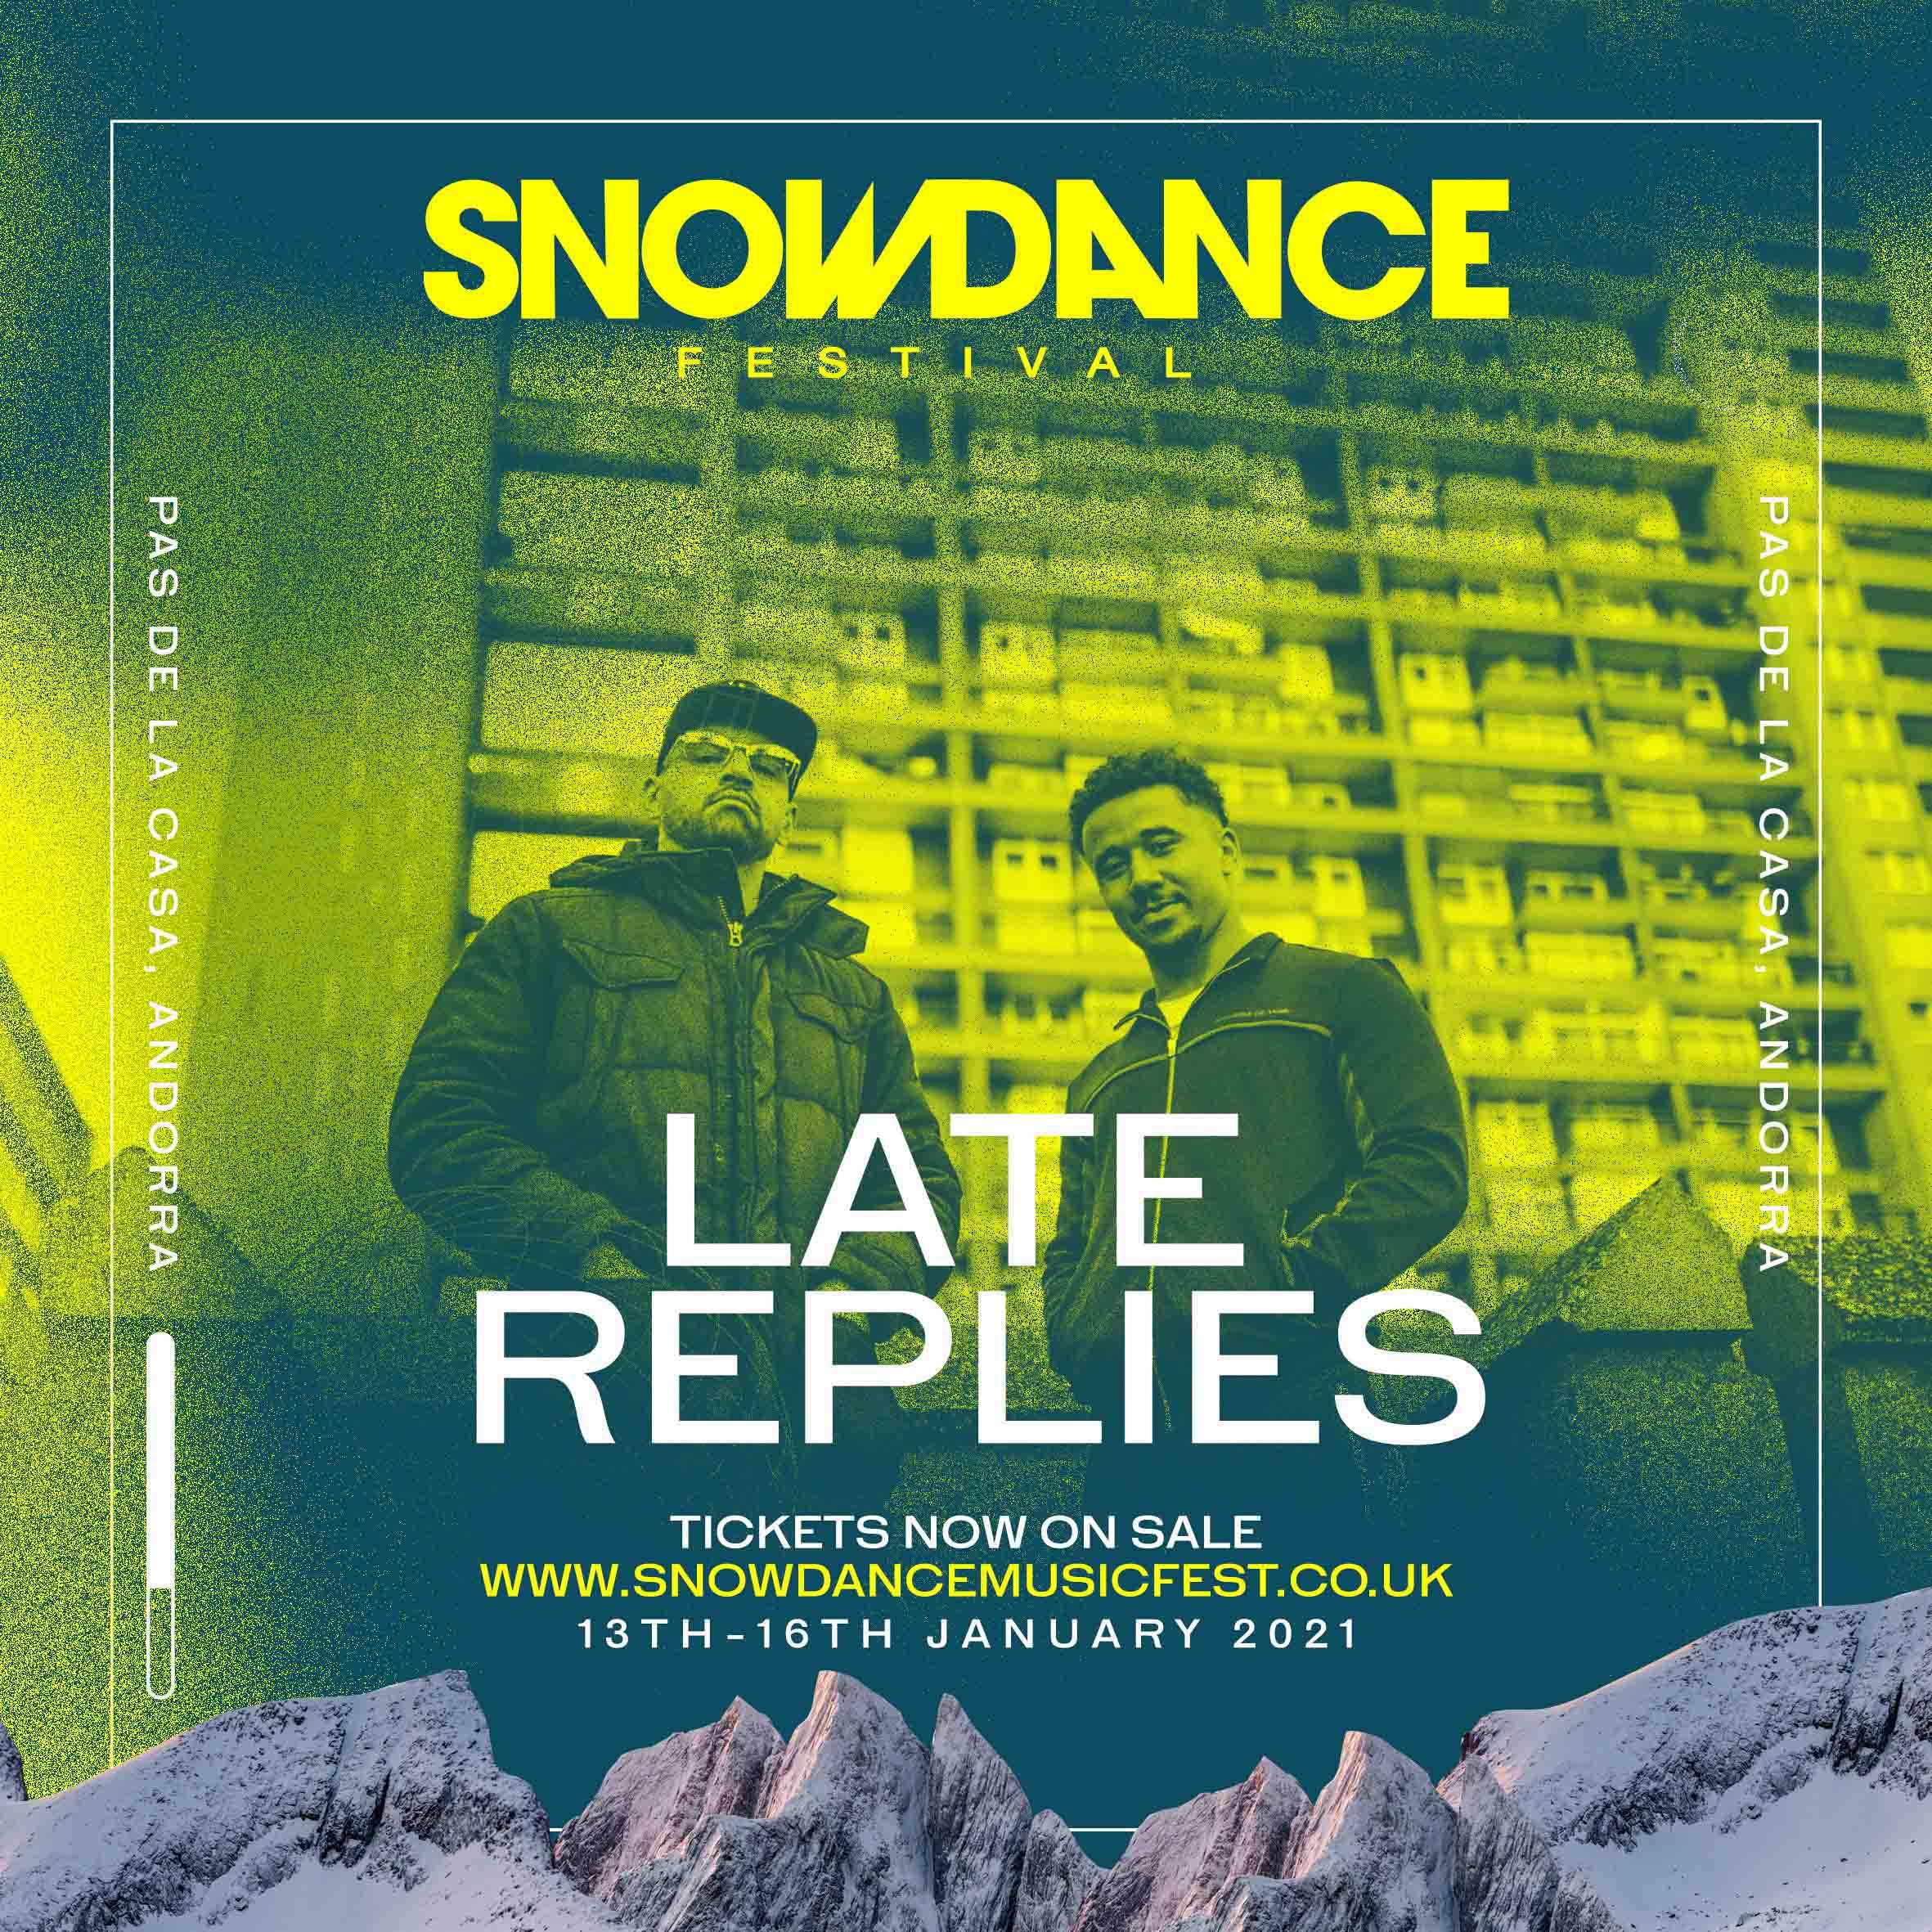 SnowDance festival late replies